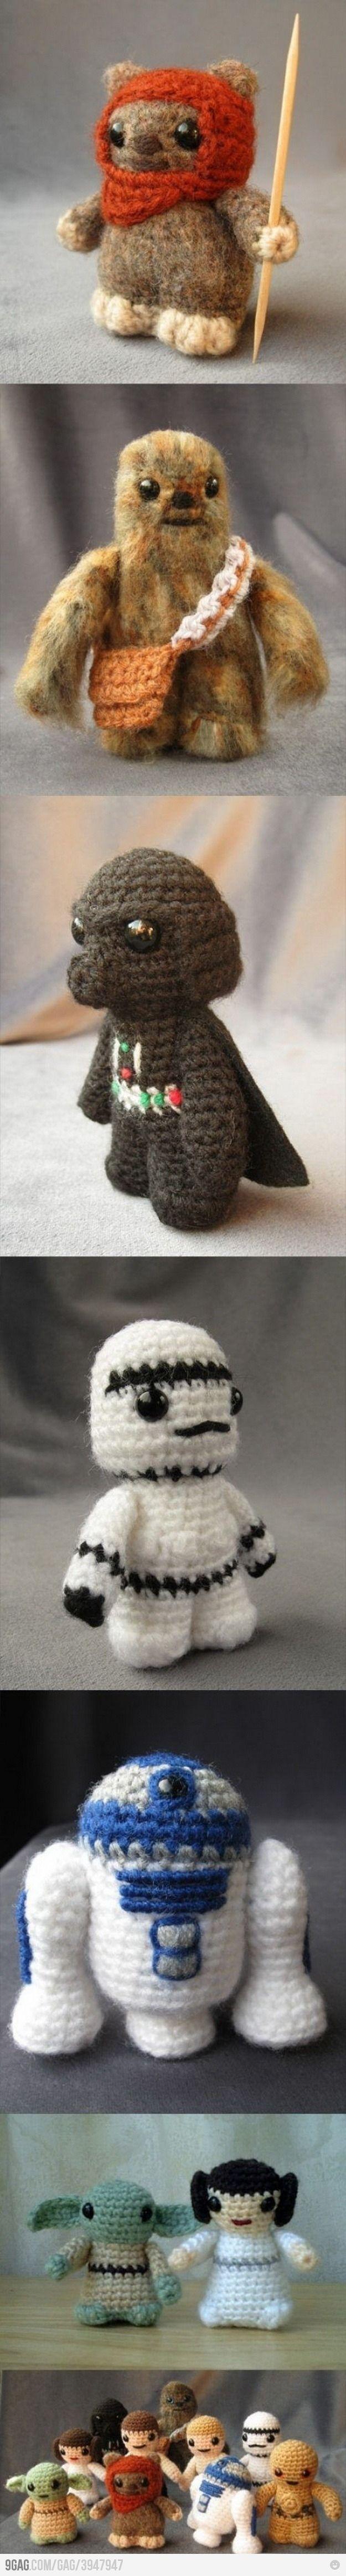 CUTE: Ewok, Starwar, Stars War Crochet, Star Wars, Stars War Character, Crochet Stars, Knits, Crafts, Amigurumi